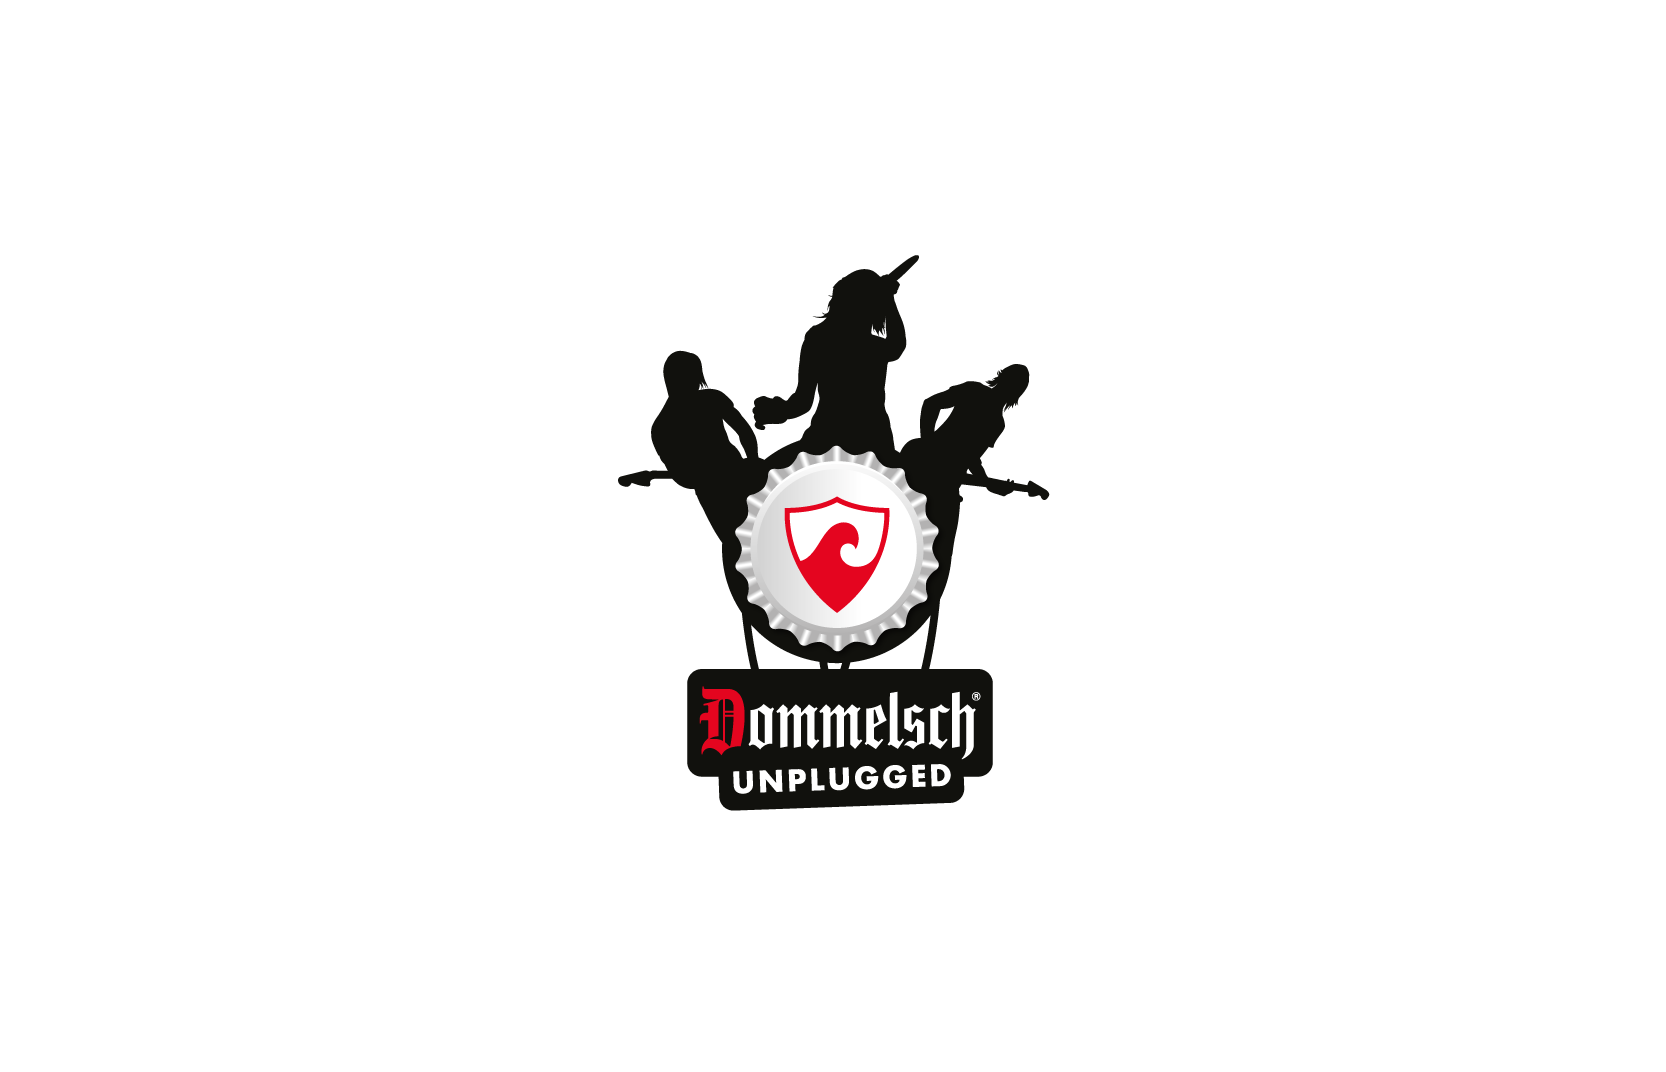 multi_dommelsch_logo4